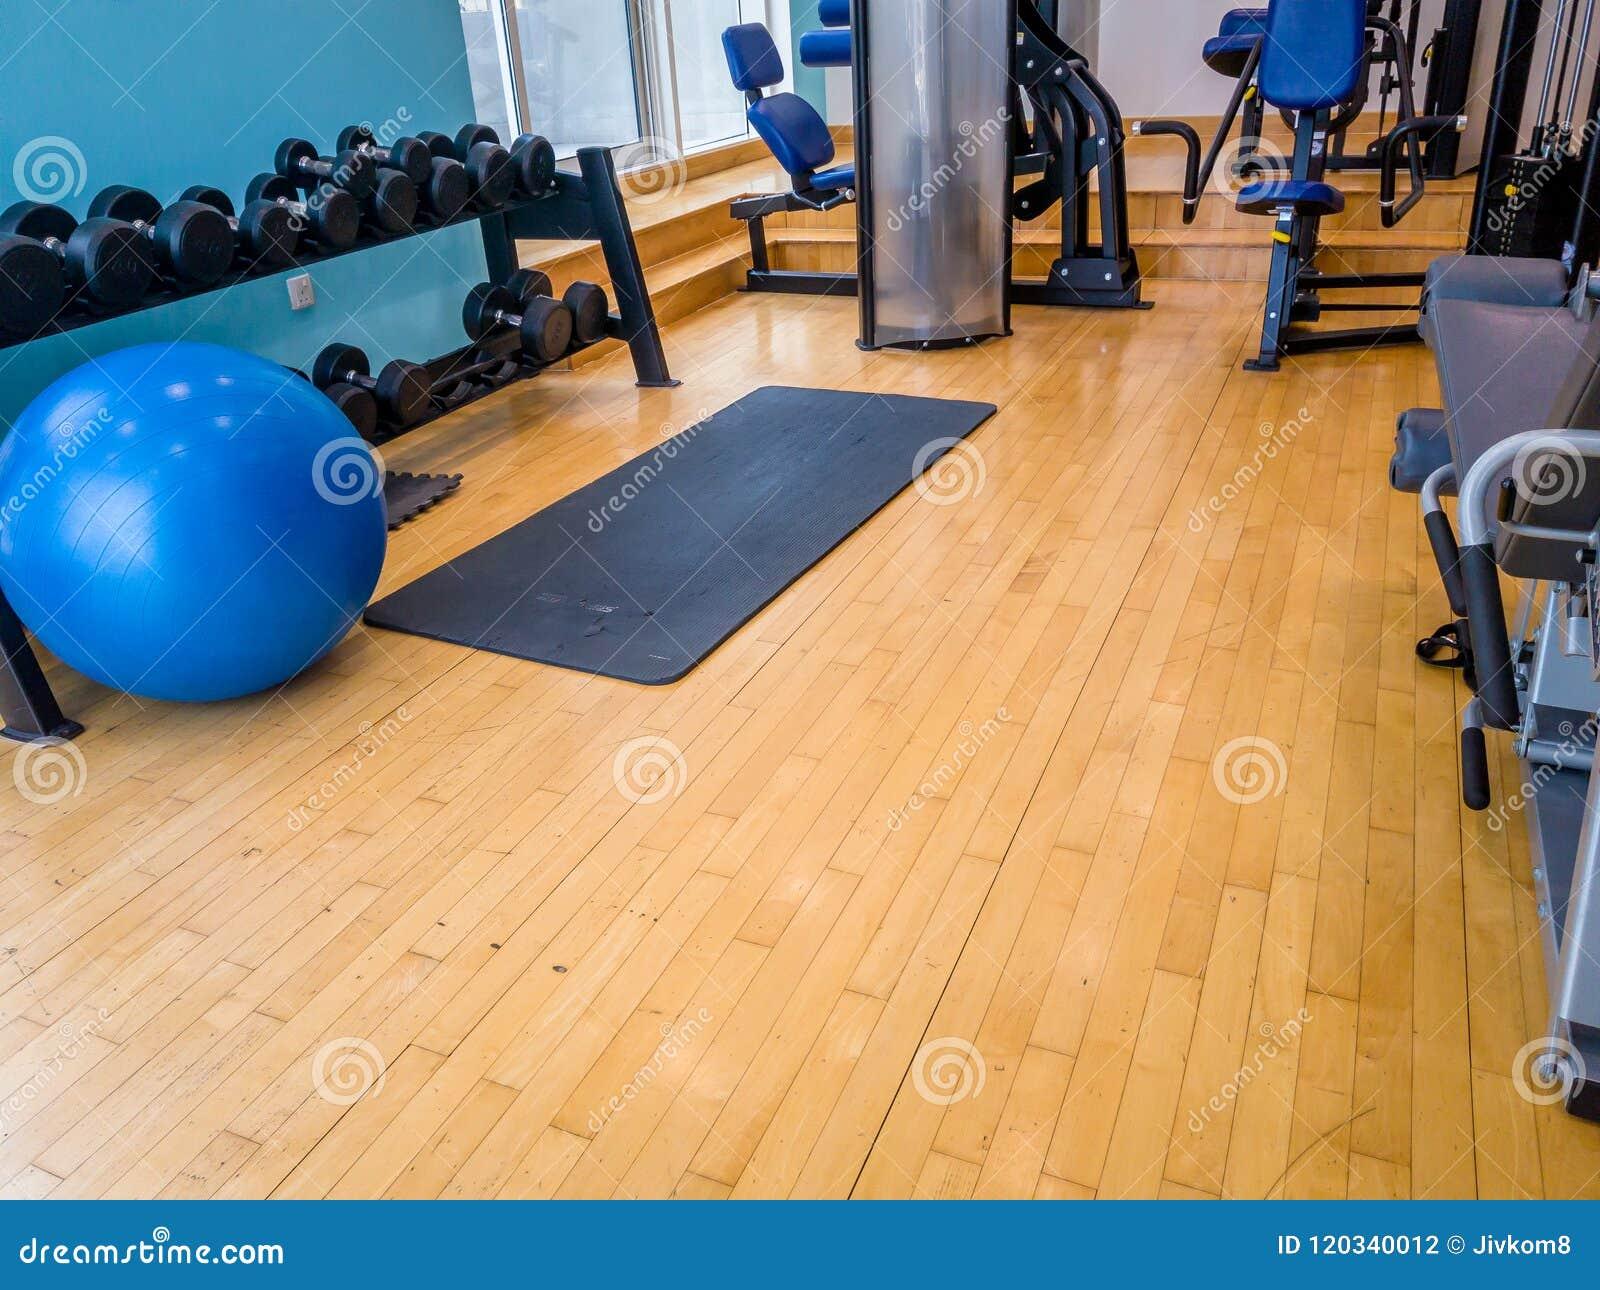 Home gym room stock photo. image of interior club room 120340012